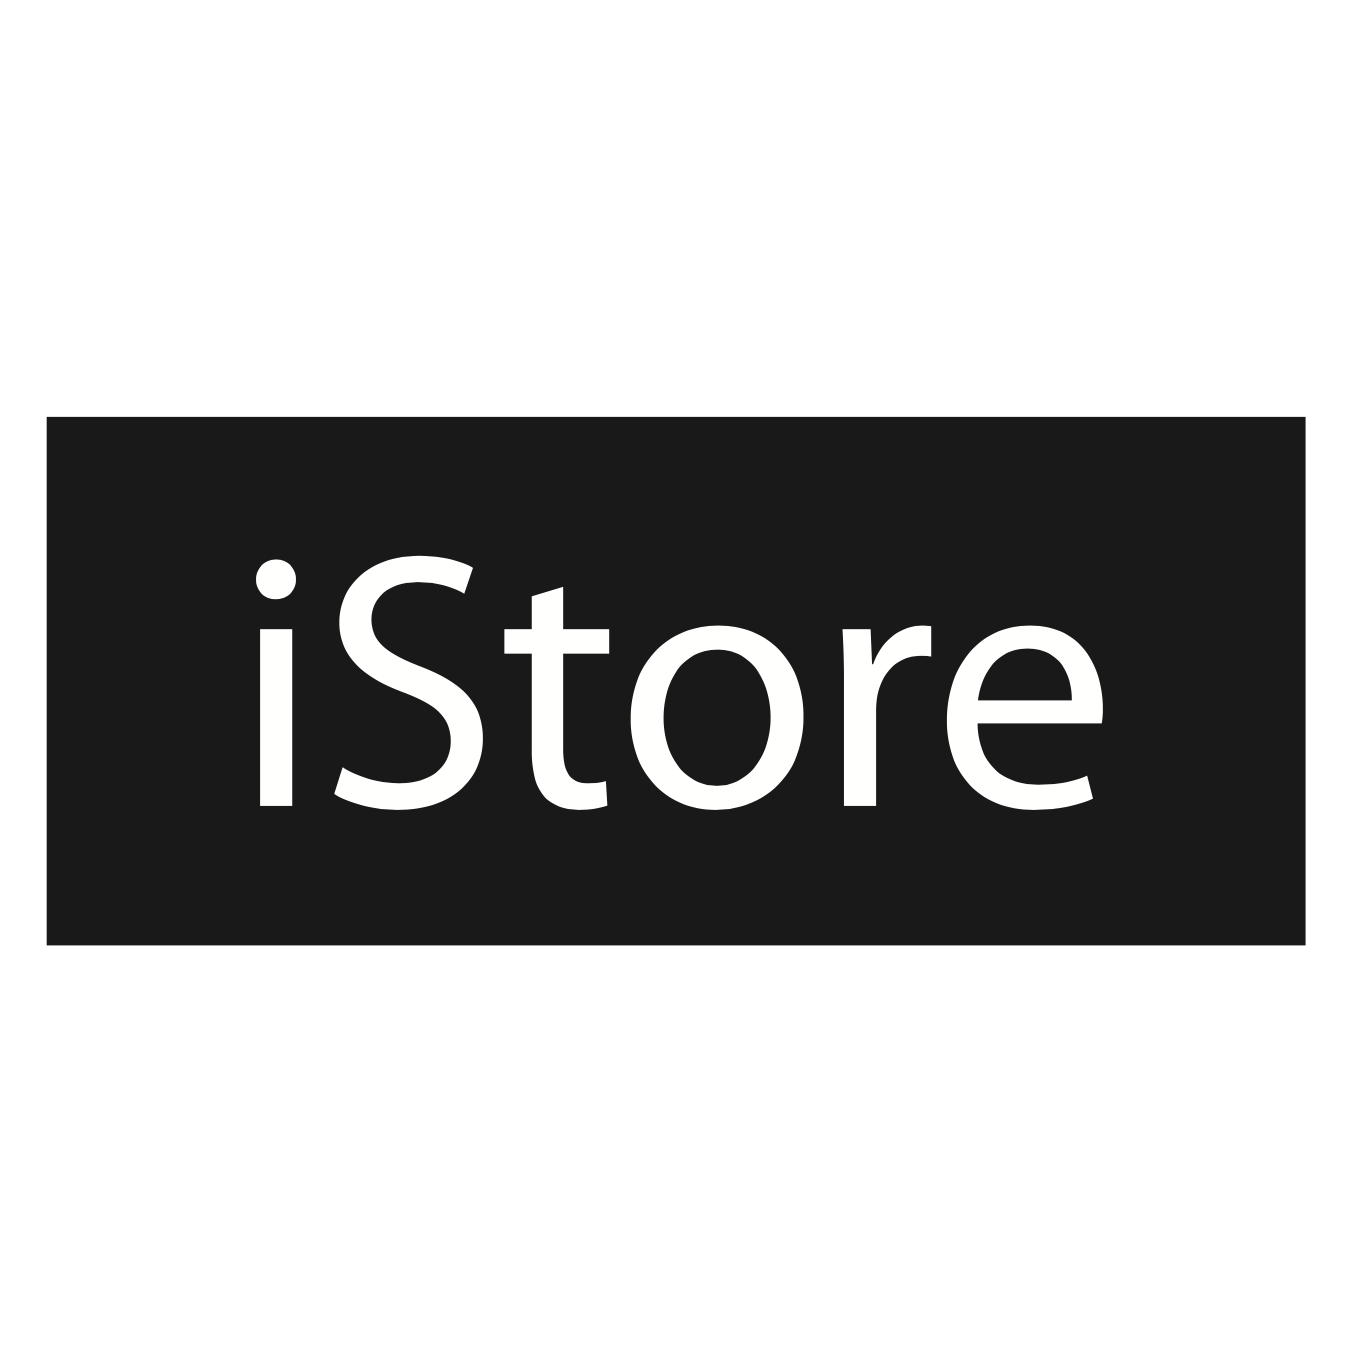 Kate Spade New York Hardshell Case for iPhone 8/7 - Dot Foxglove Ombre RoseGold Foil